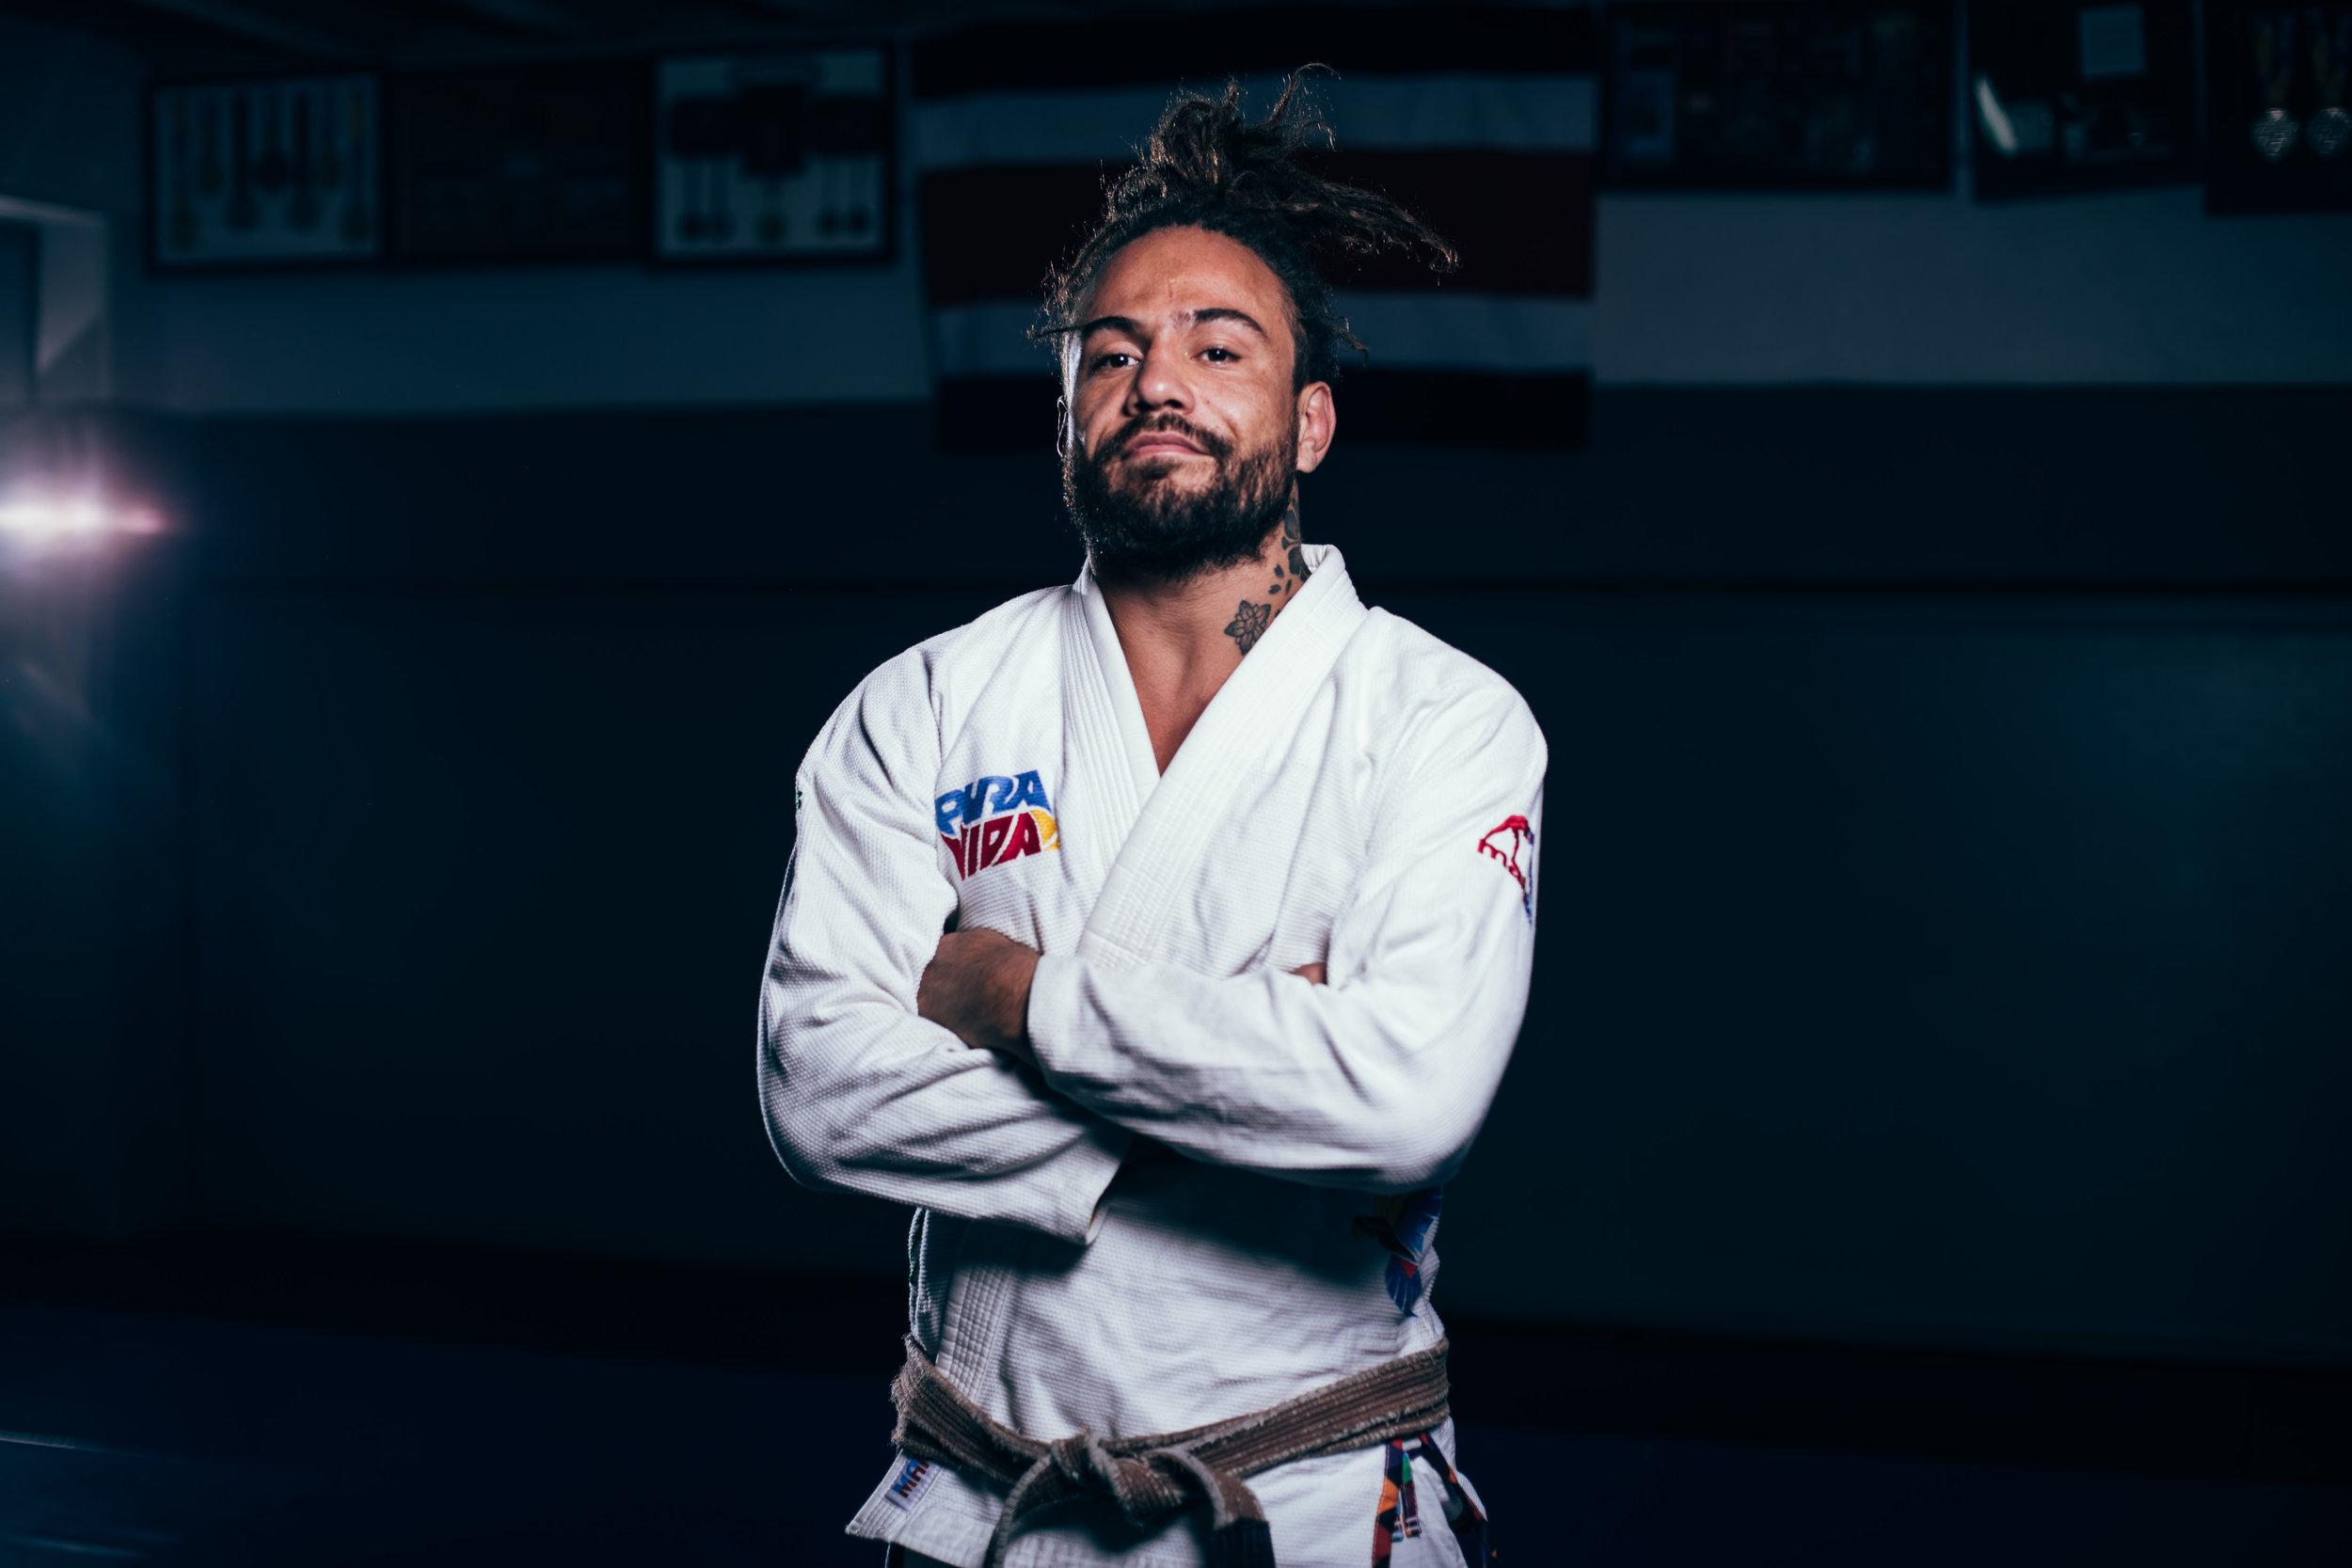 Arannick Montero - BJJ & MMA Fighter/Instructor